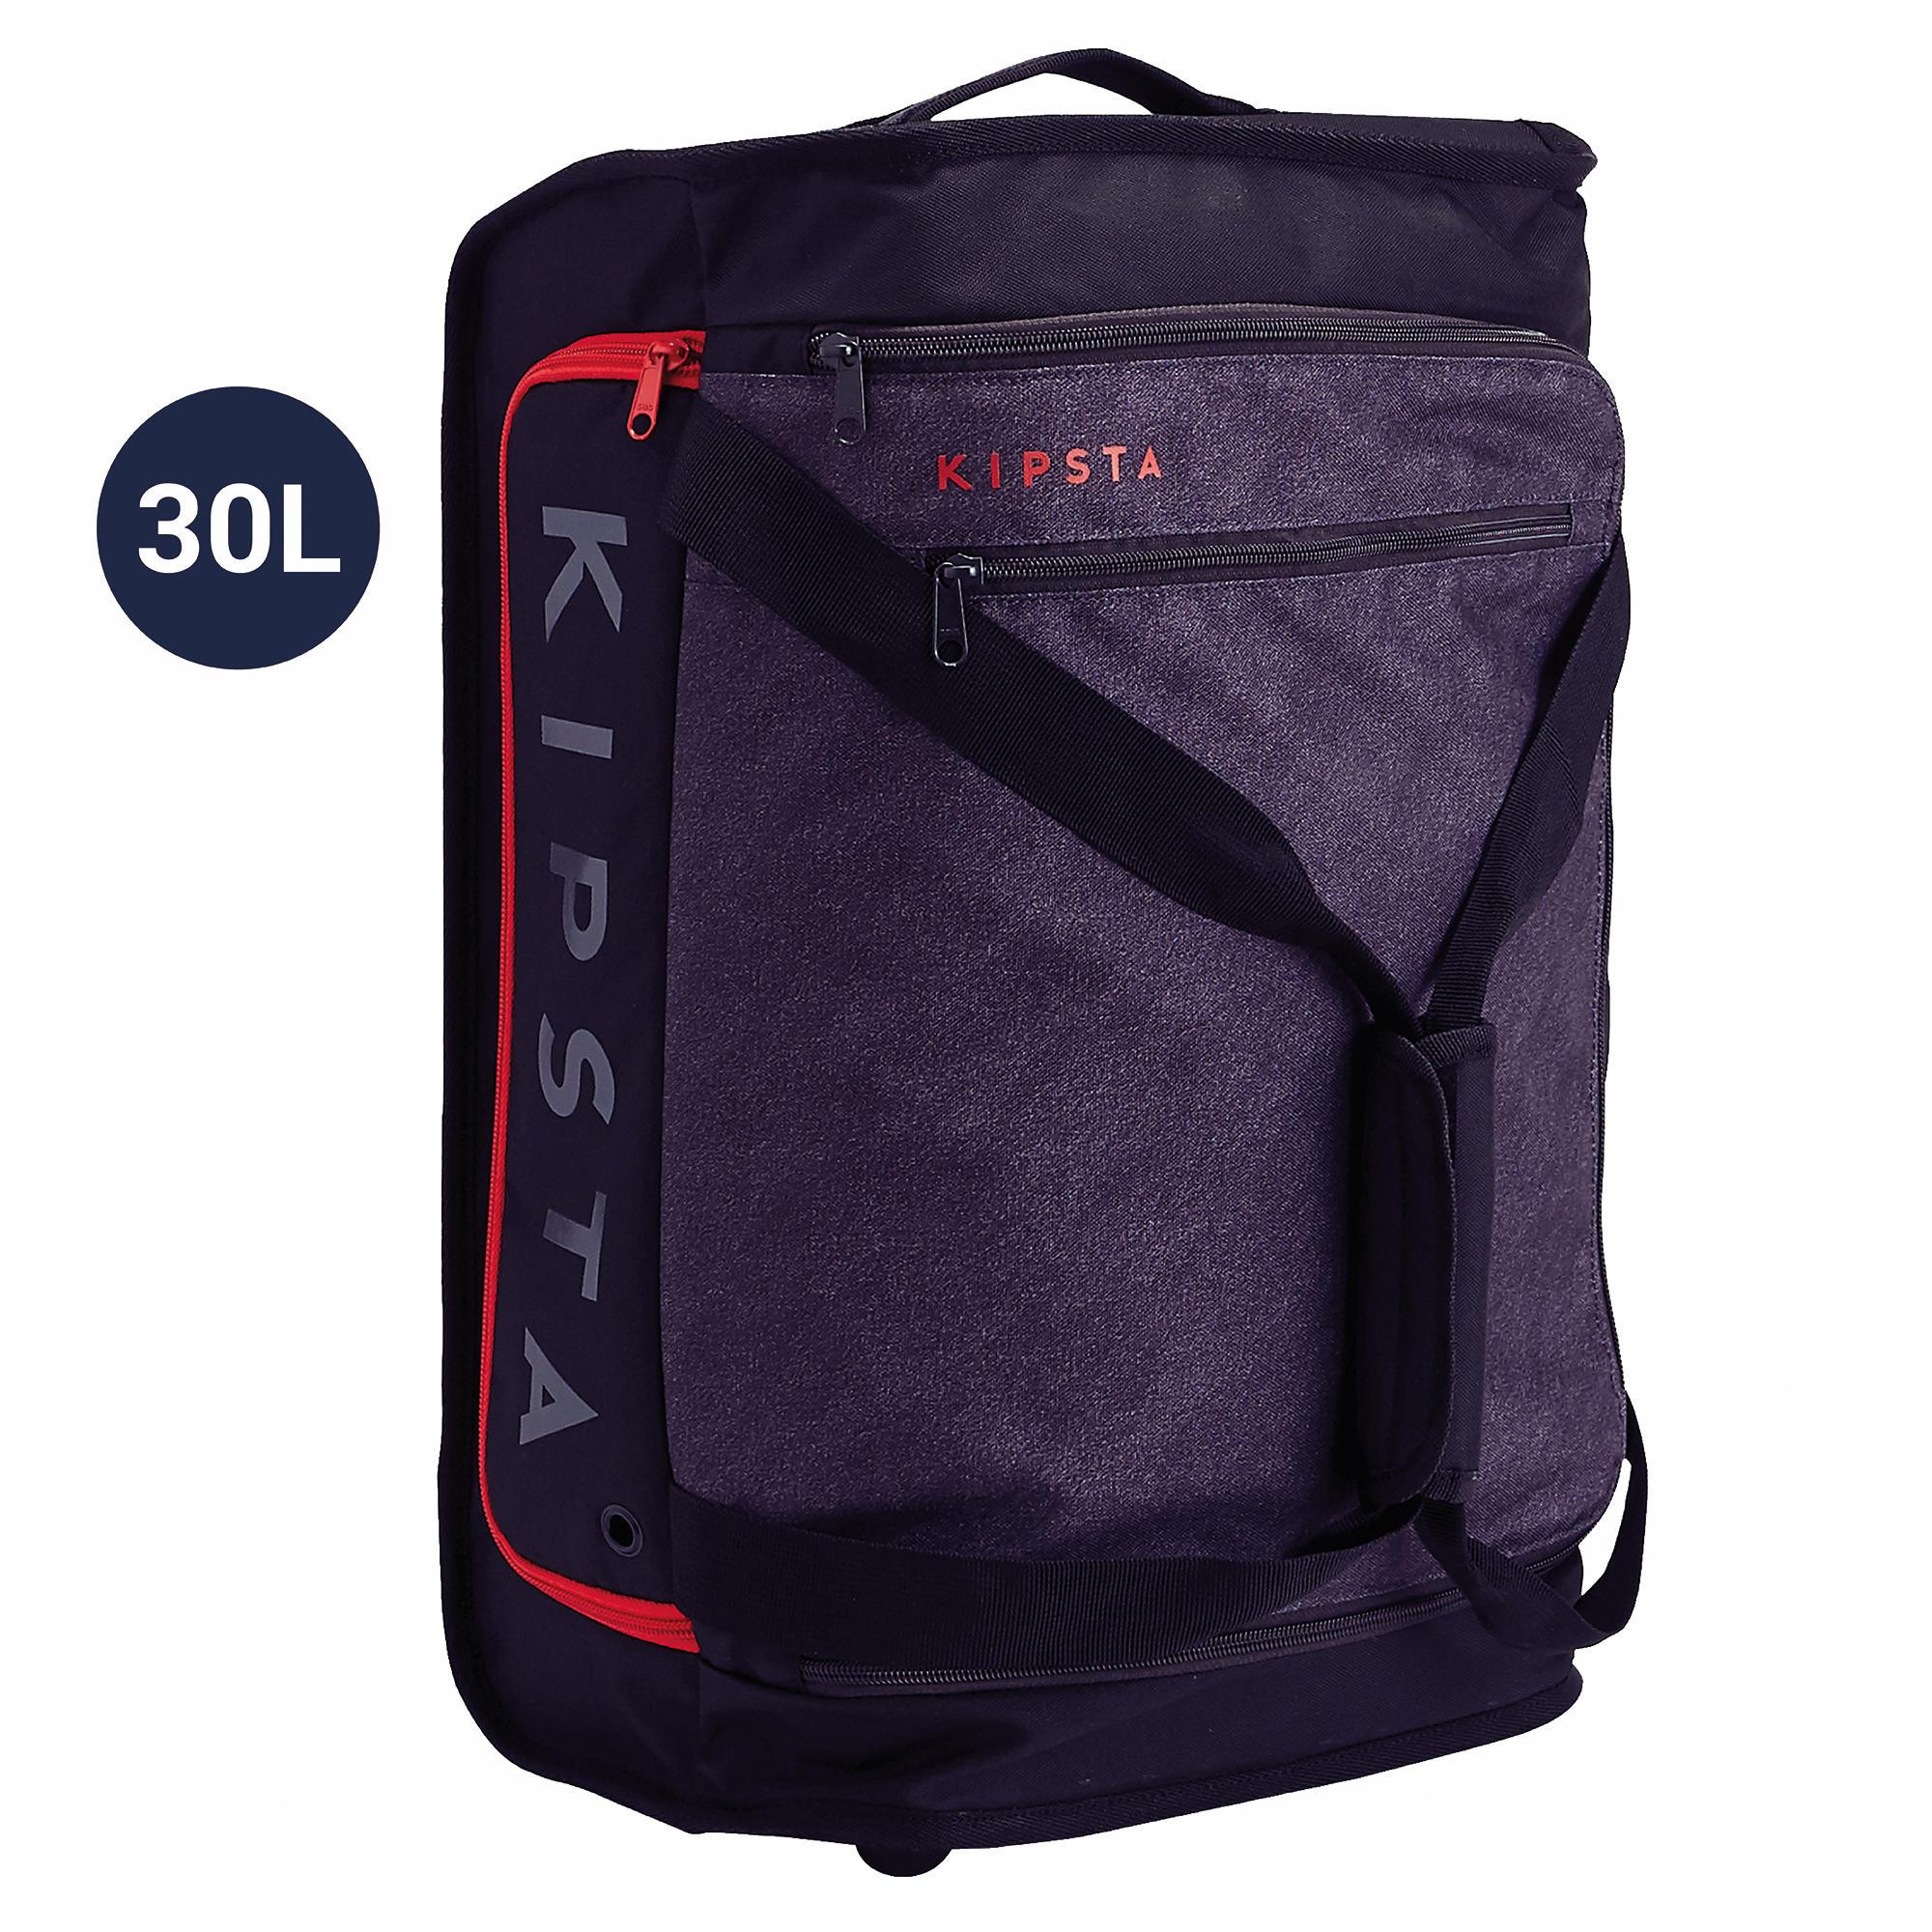 Kipsta Handbagage trolley Classic 30 liter zwart/rood